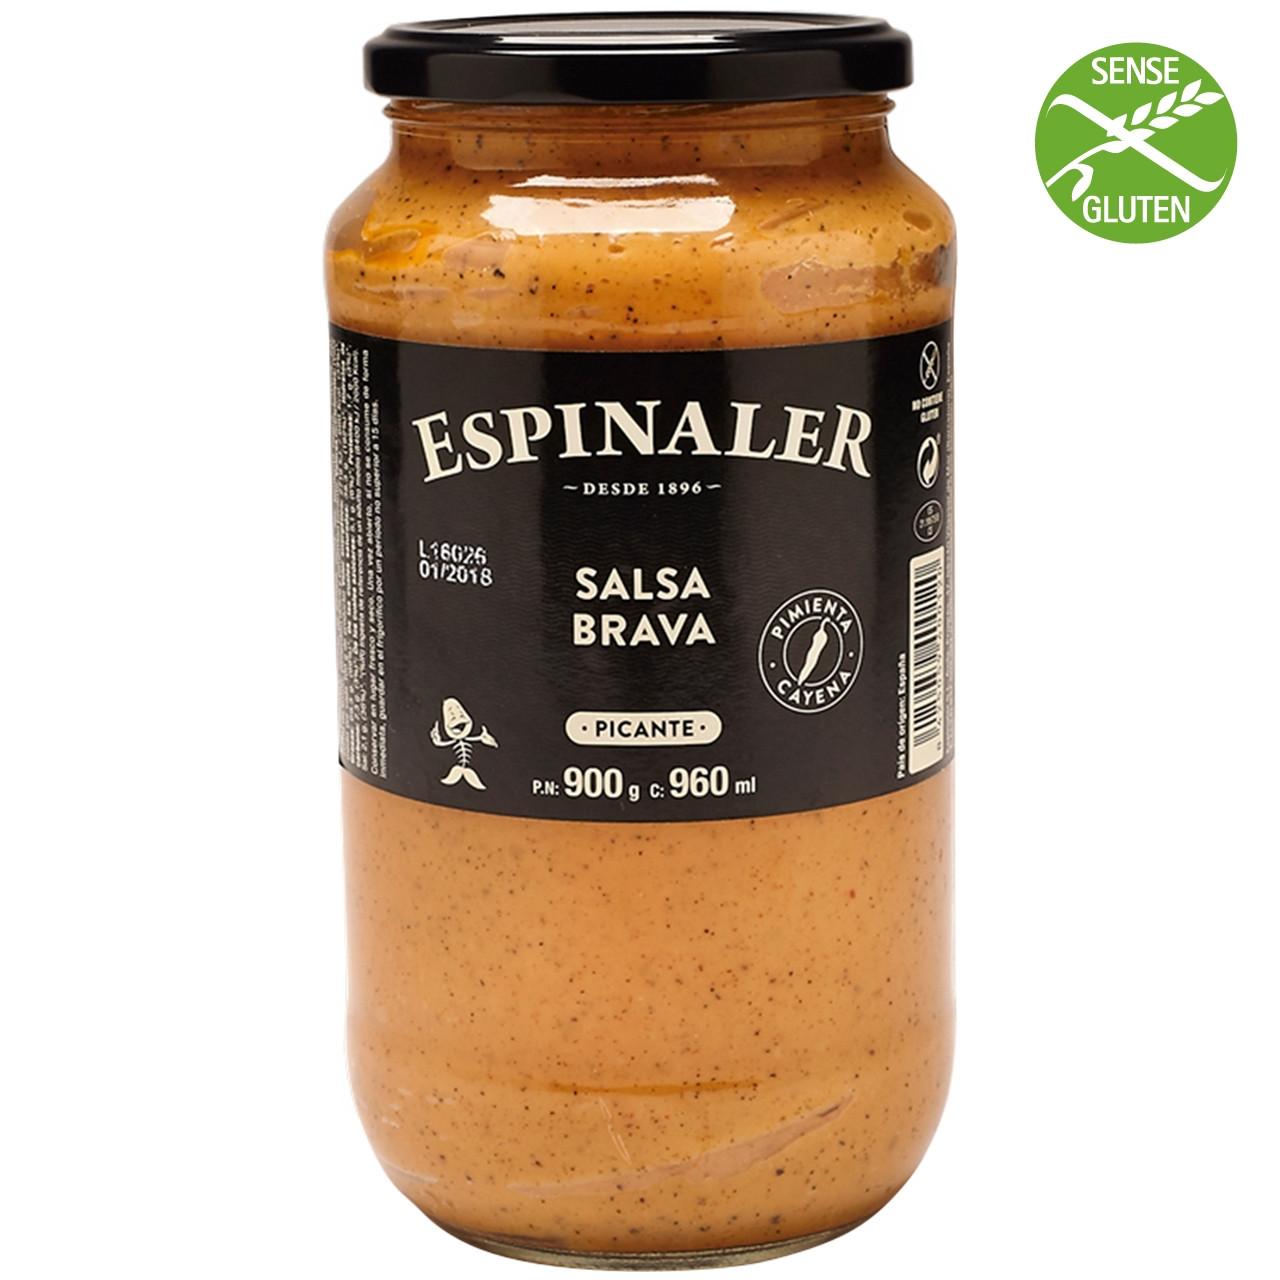 Espinaler-salsa brava